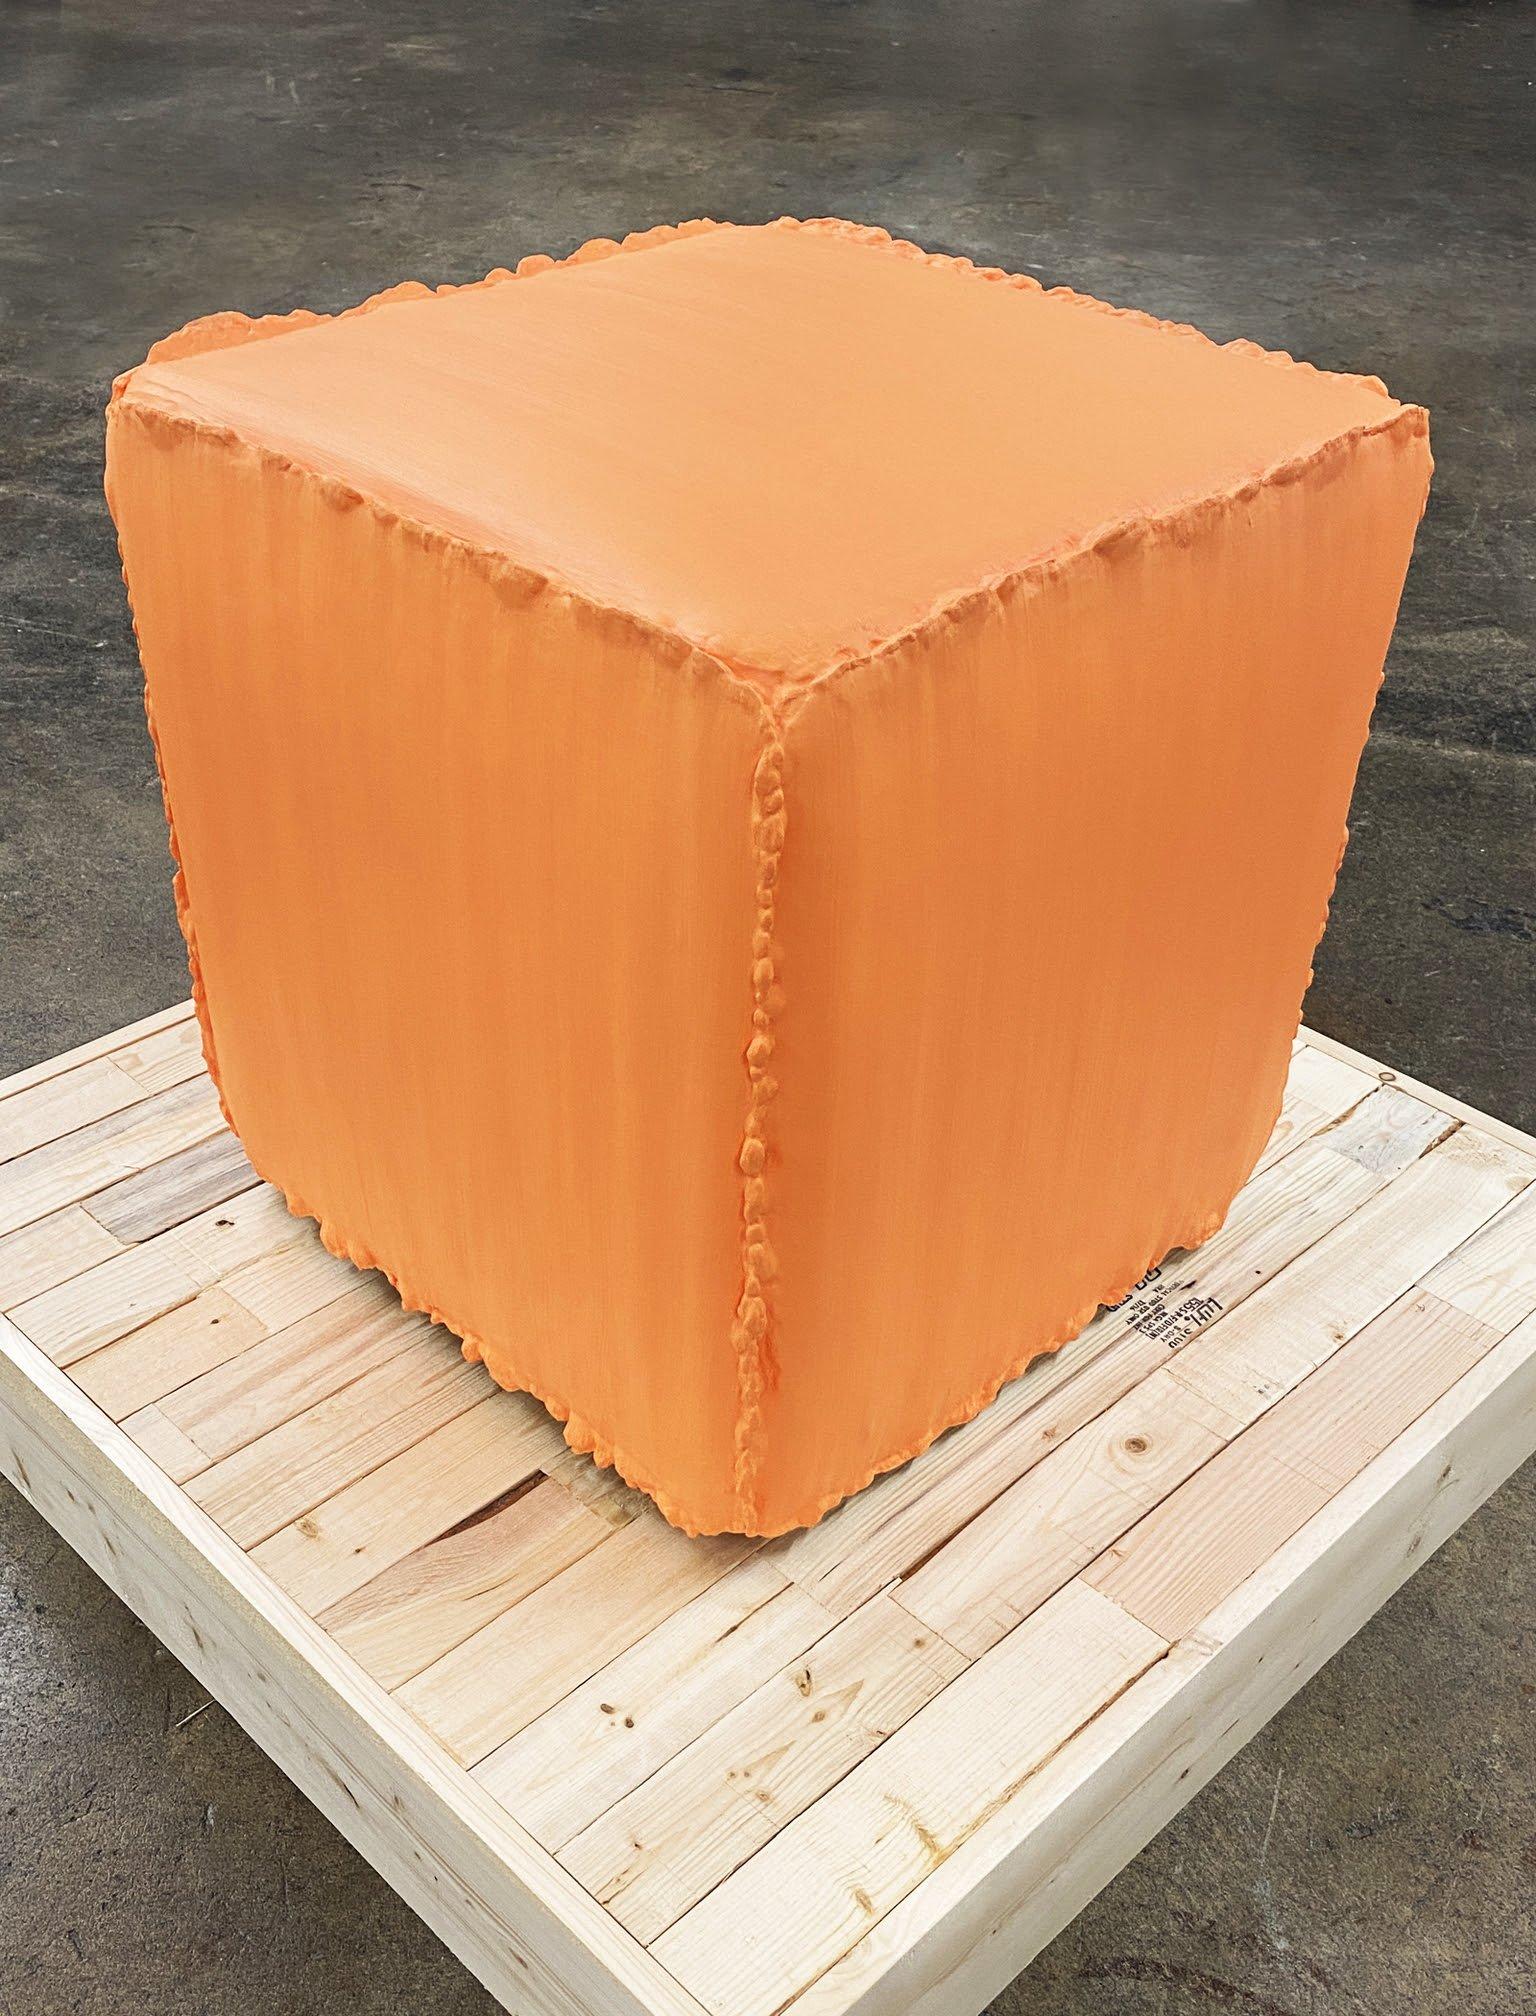 Orange Cube, 2020, acrylic paint, wood, gypsum, 19.5 × 19.5 × 20 in